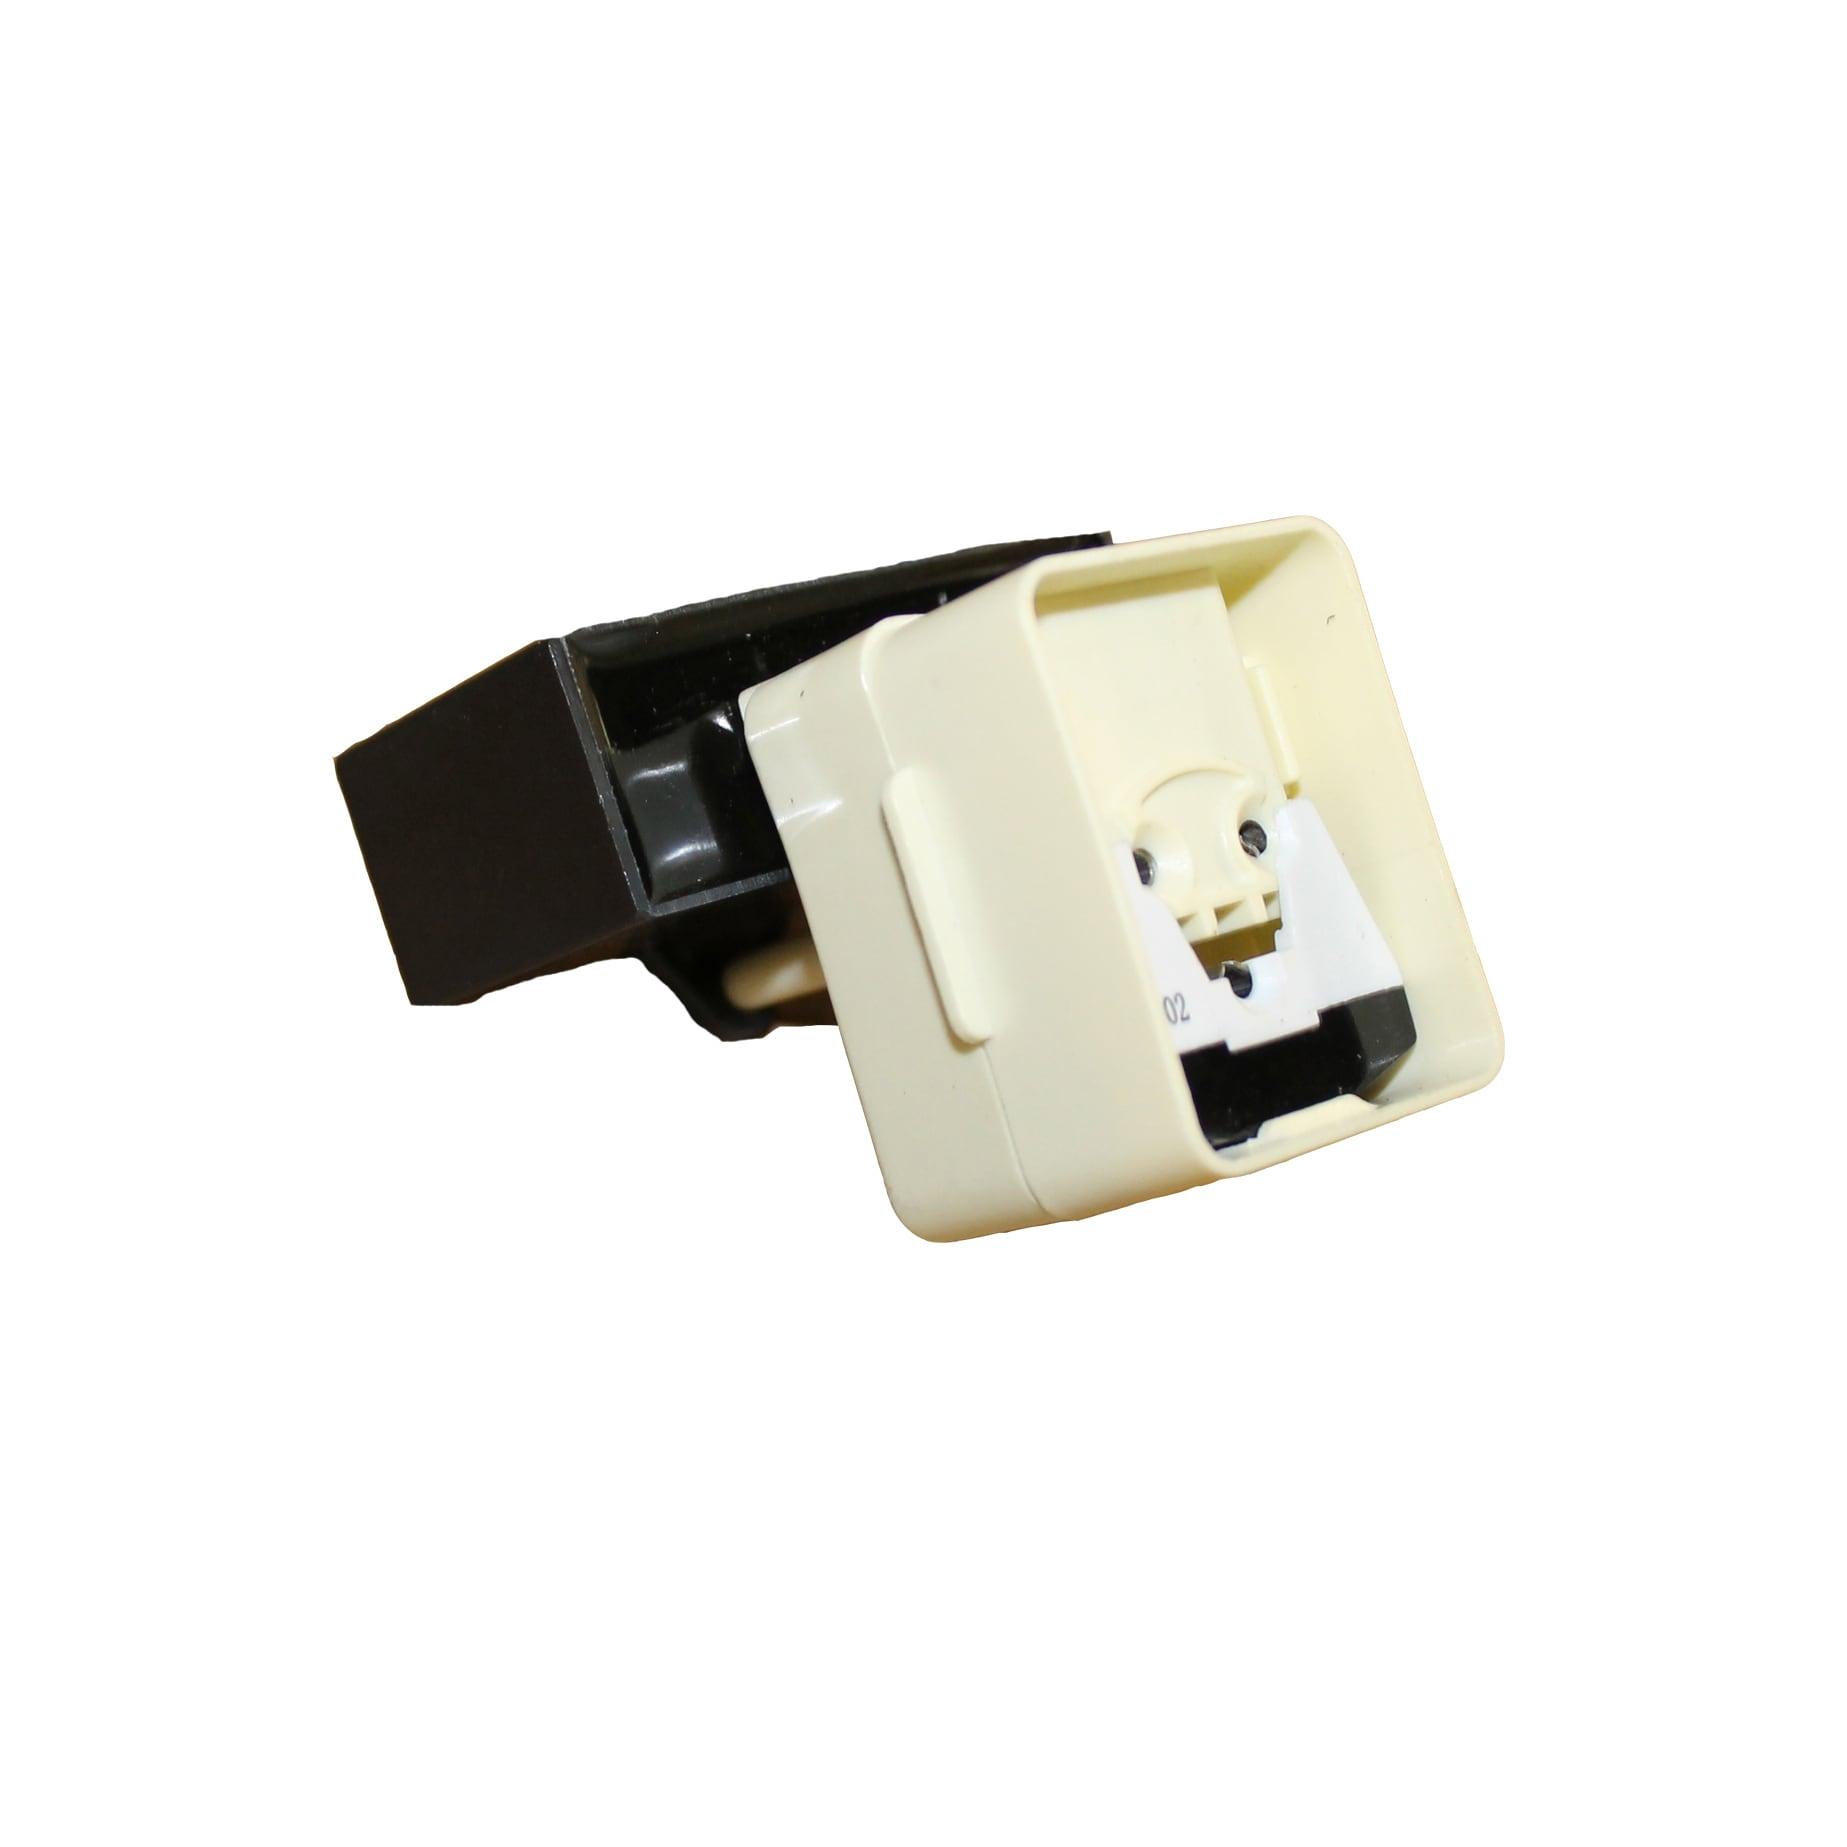 Crucial Whirlpool Start Device (start device), White